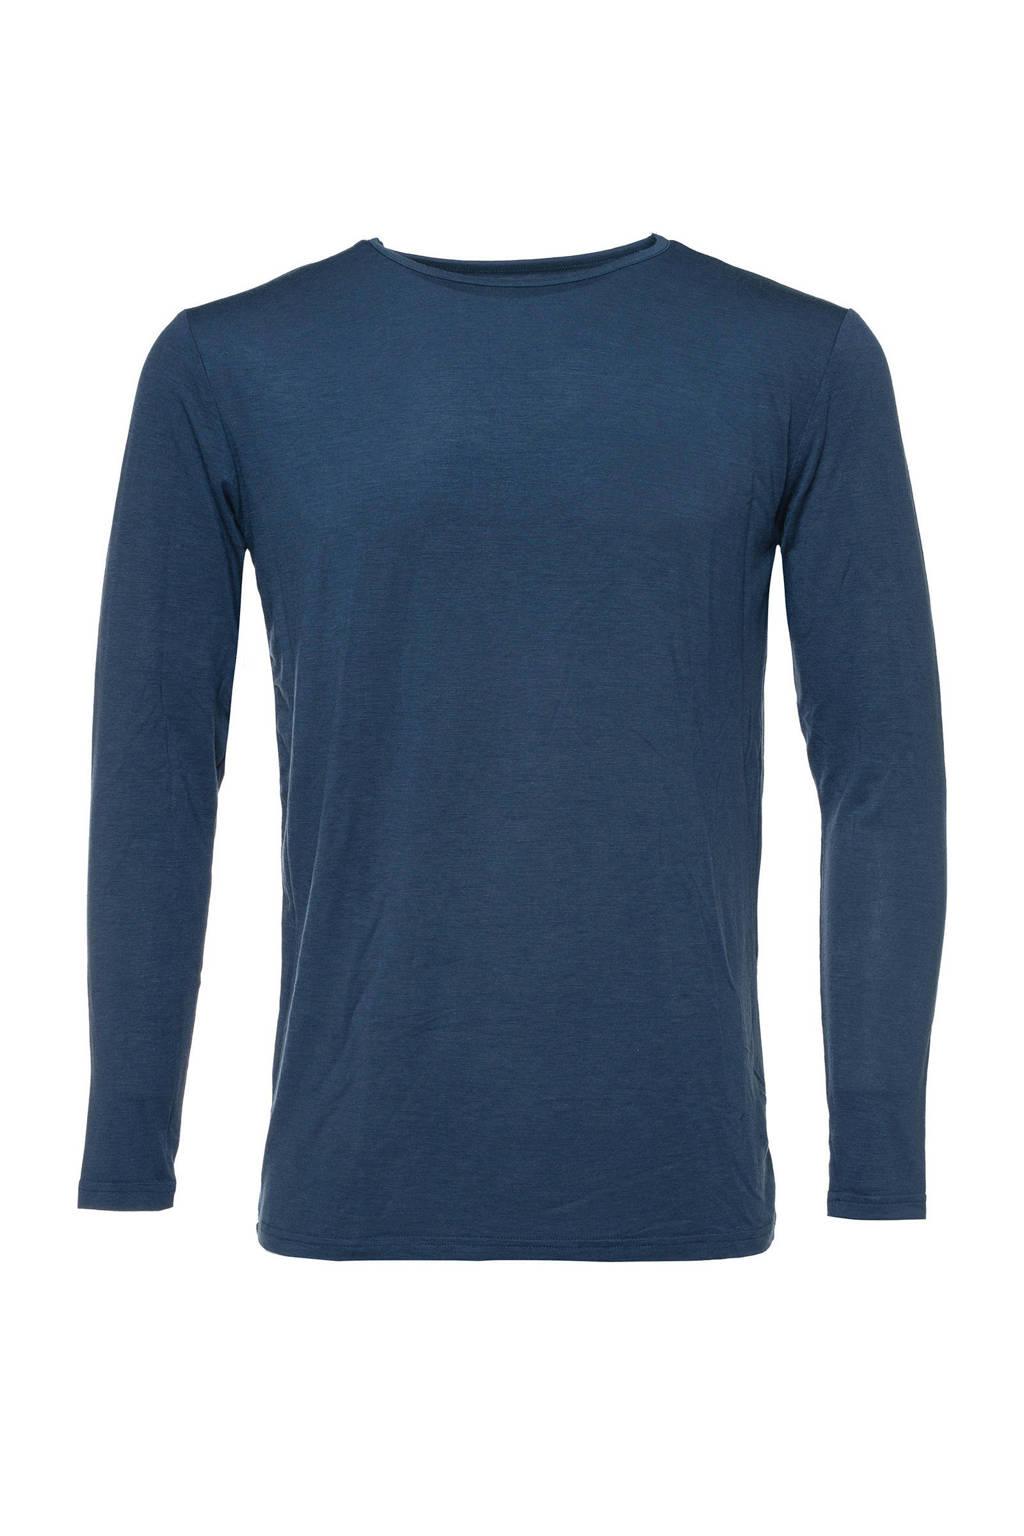 Mountain Peak thermo shirt blauw, Blauw